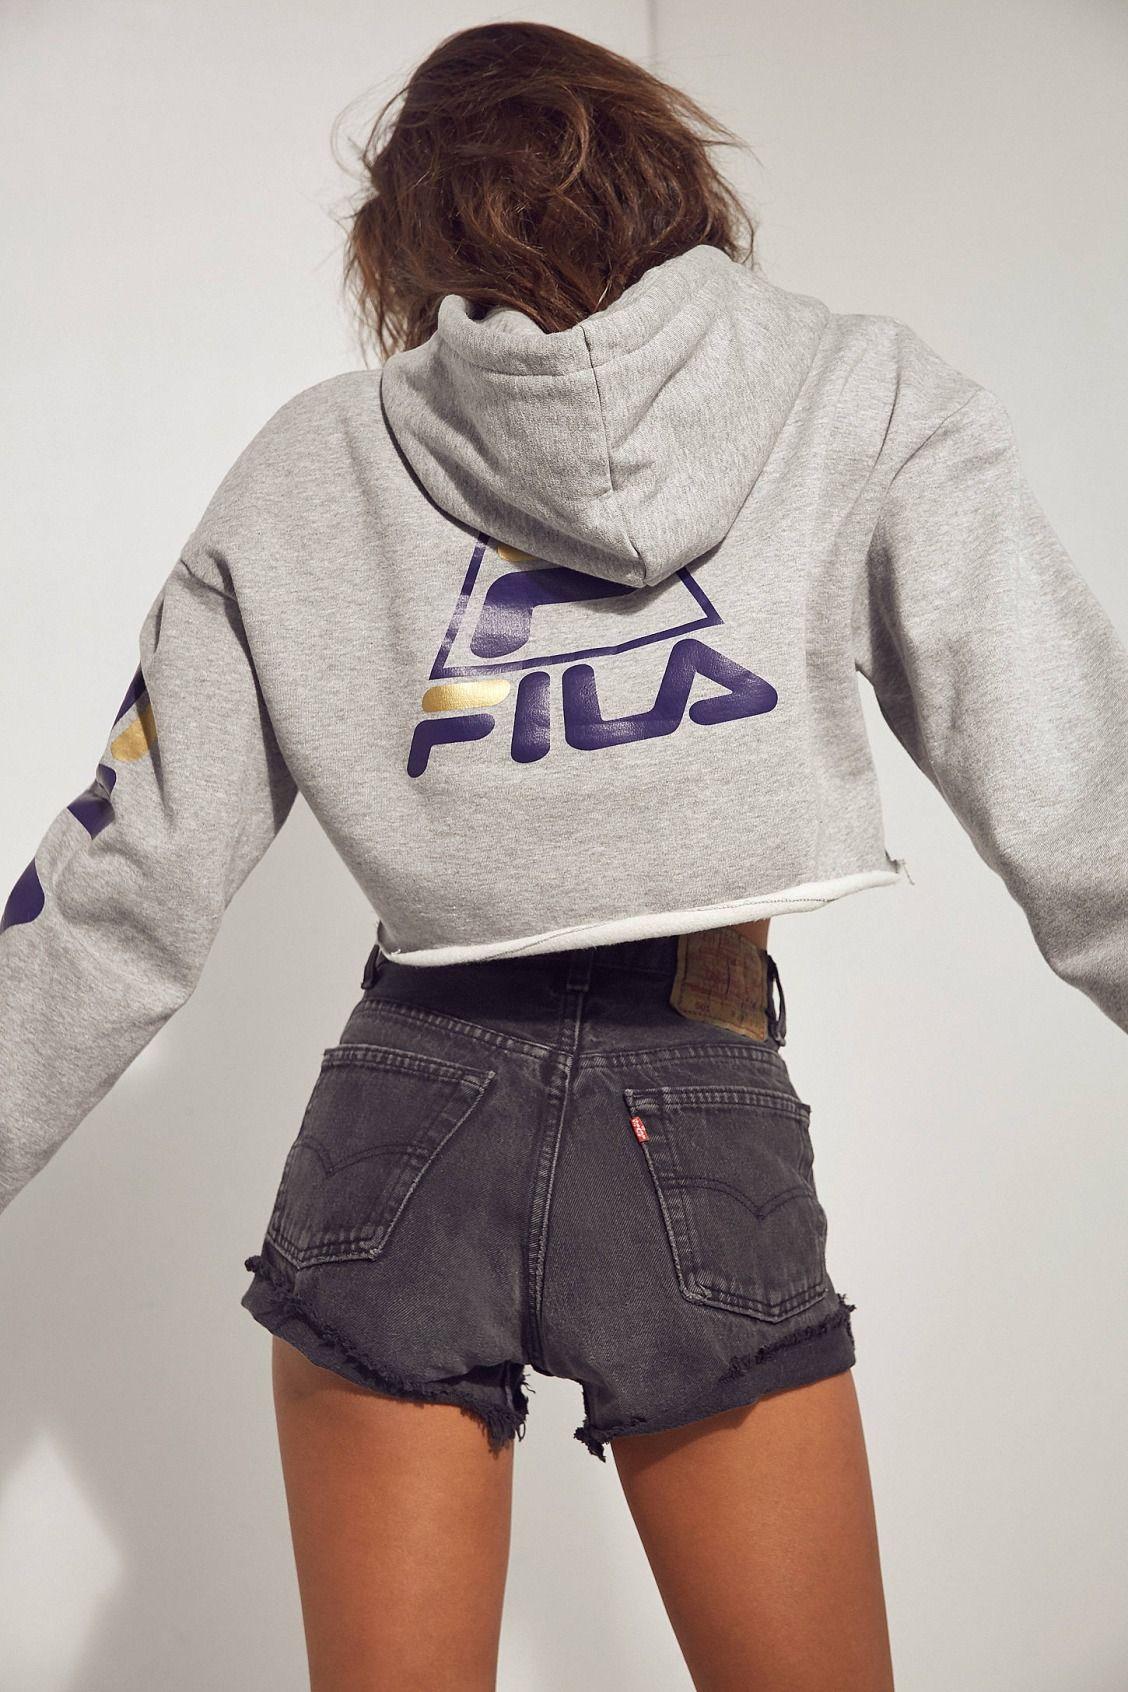 93565569b260b FILA + UO Basketball Cropped Hoodie Sweatshirt | Urban Outfitters ...